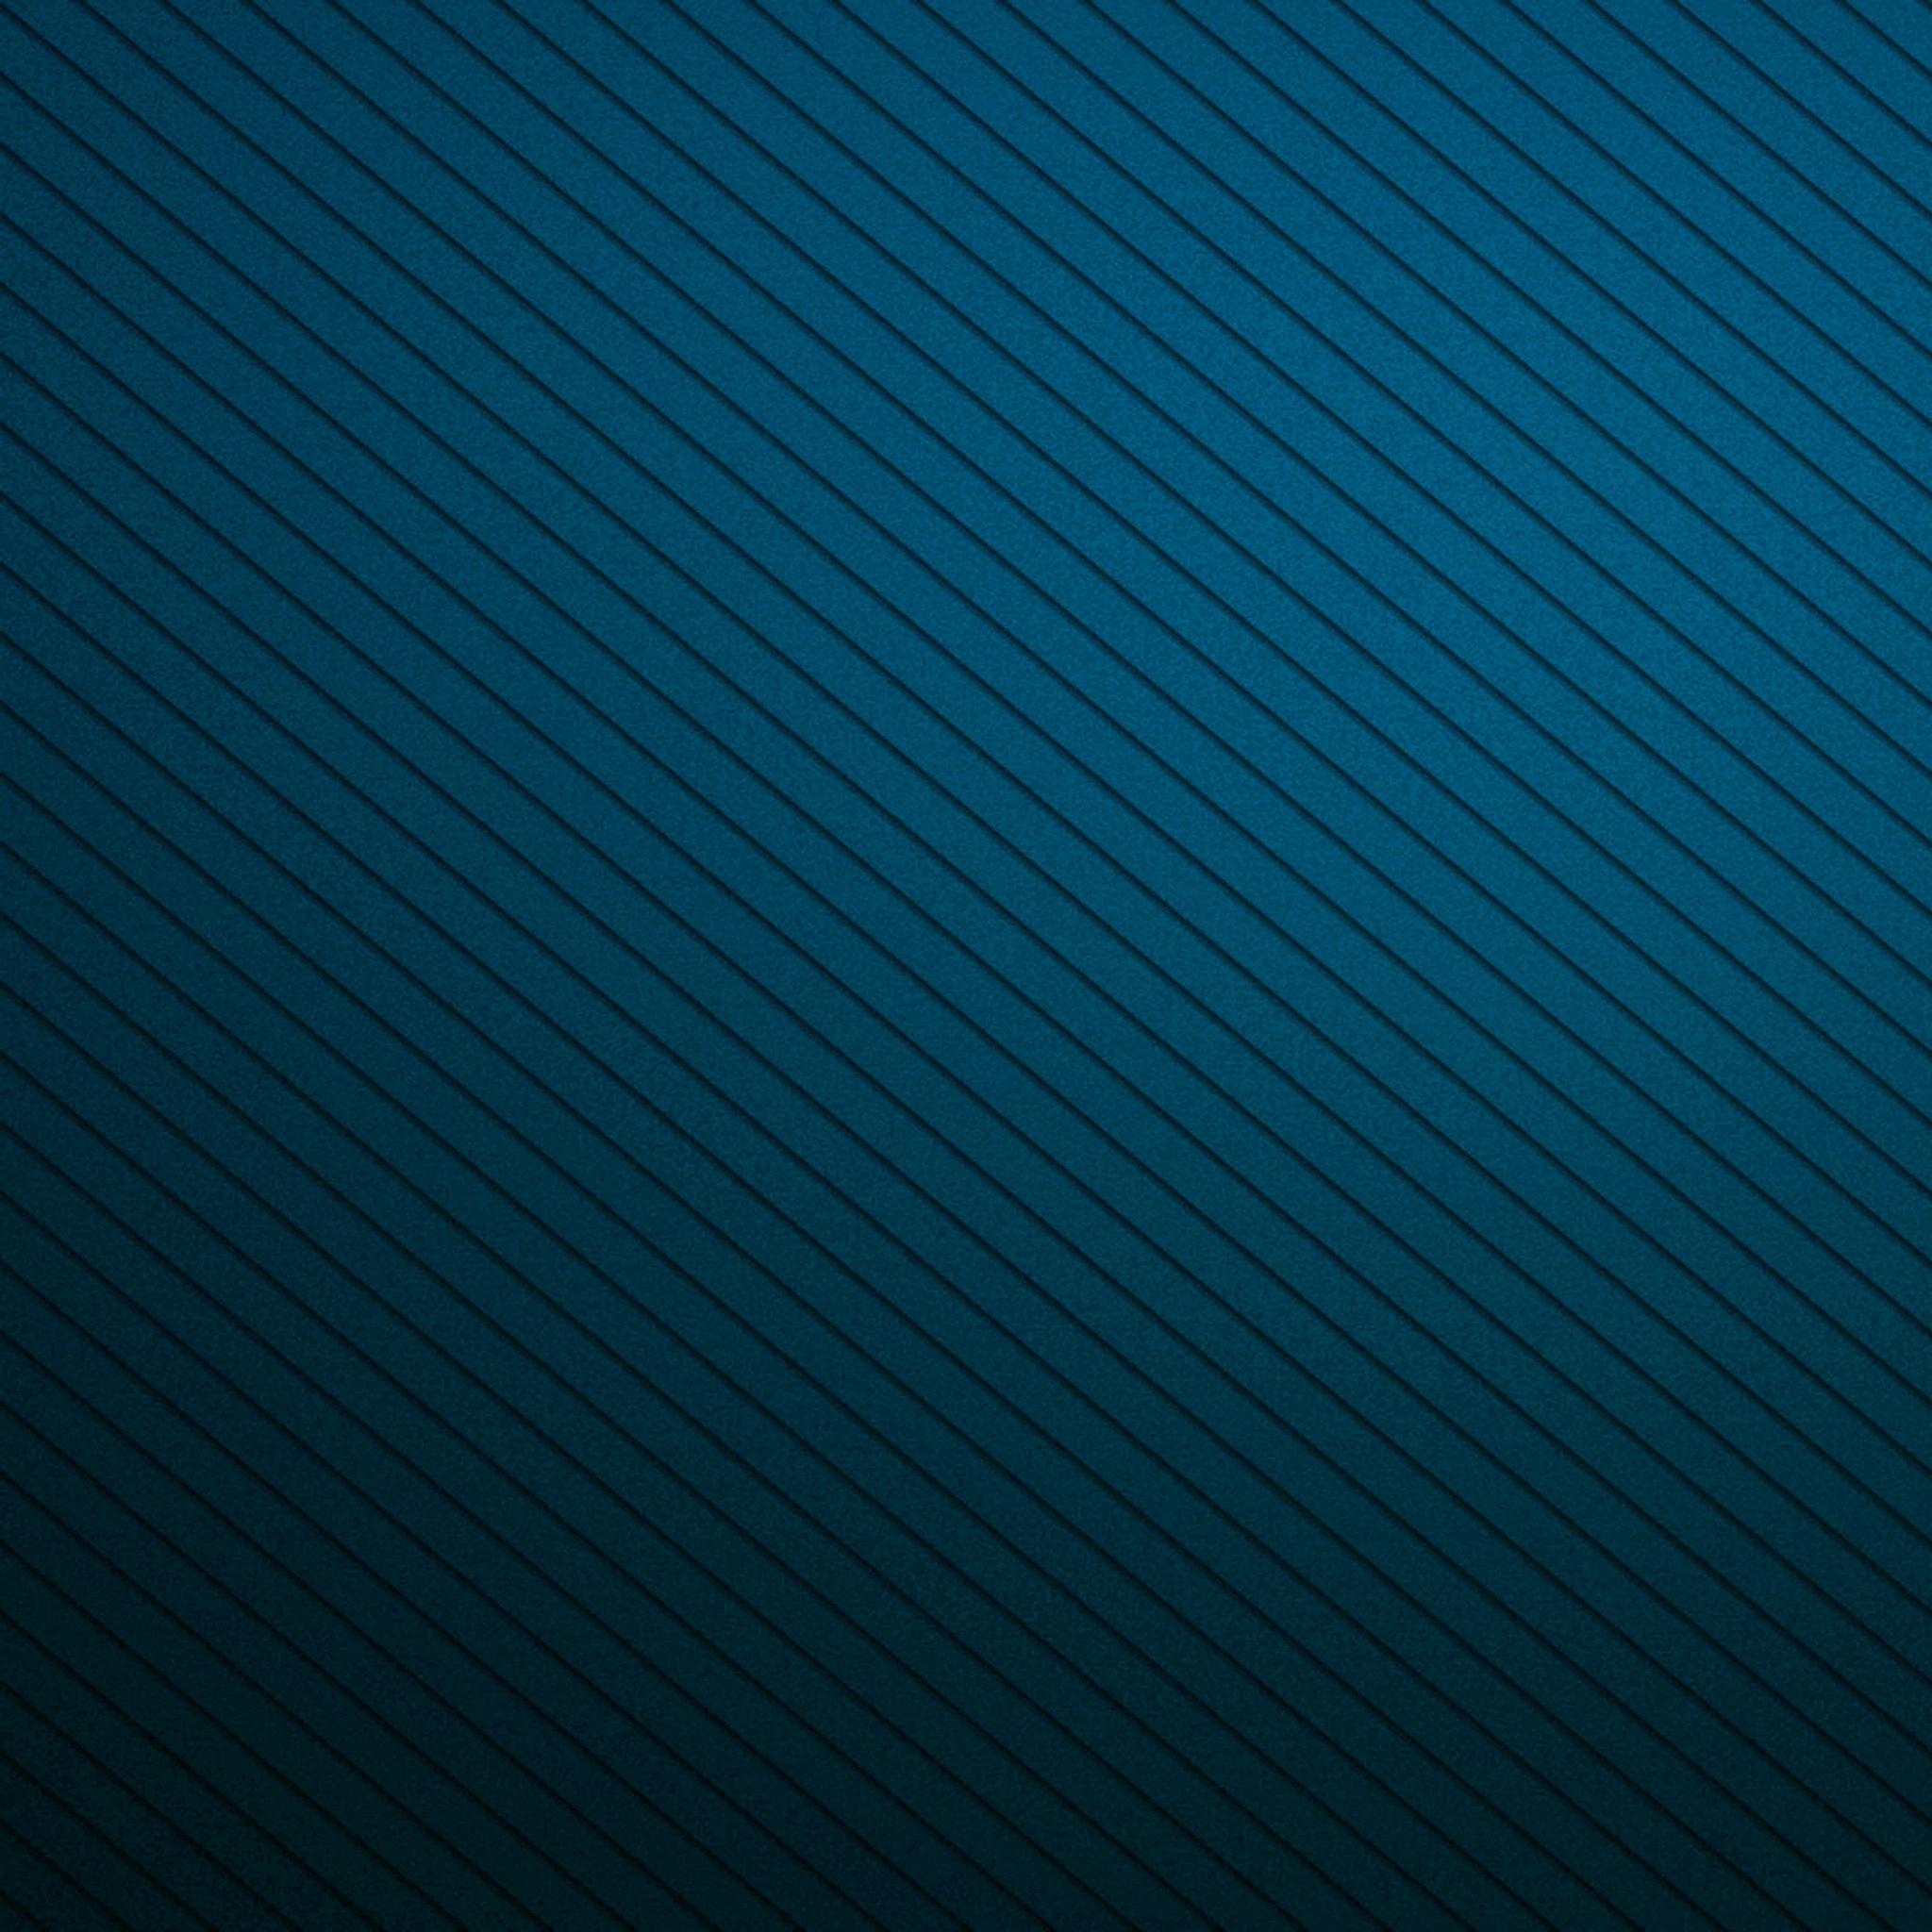 freeios7 apple wallpaper ipad air ipad retina jpg Car Pictures 2048x2048